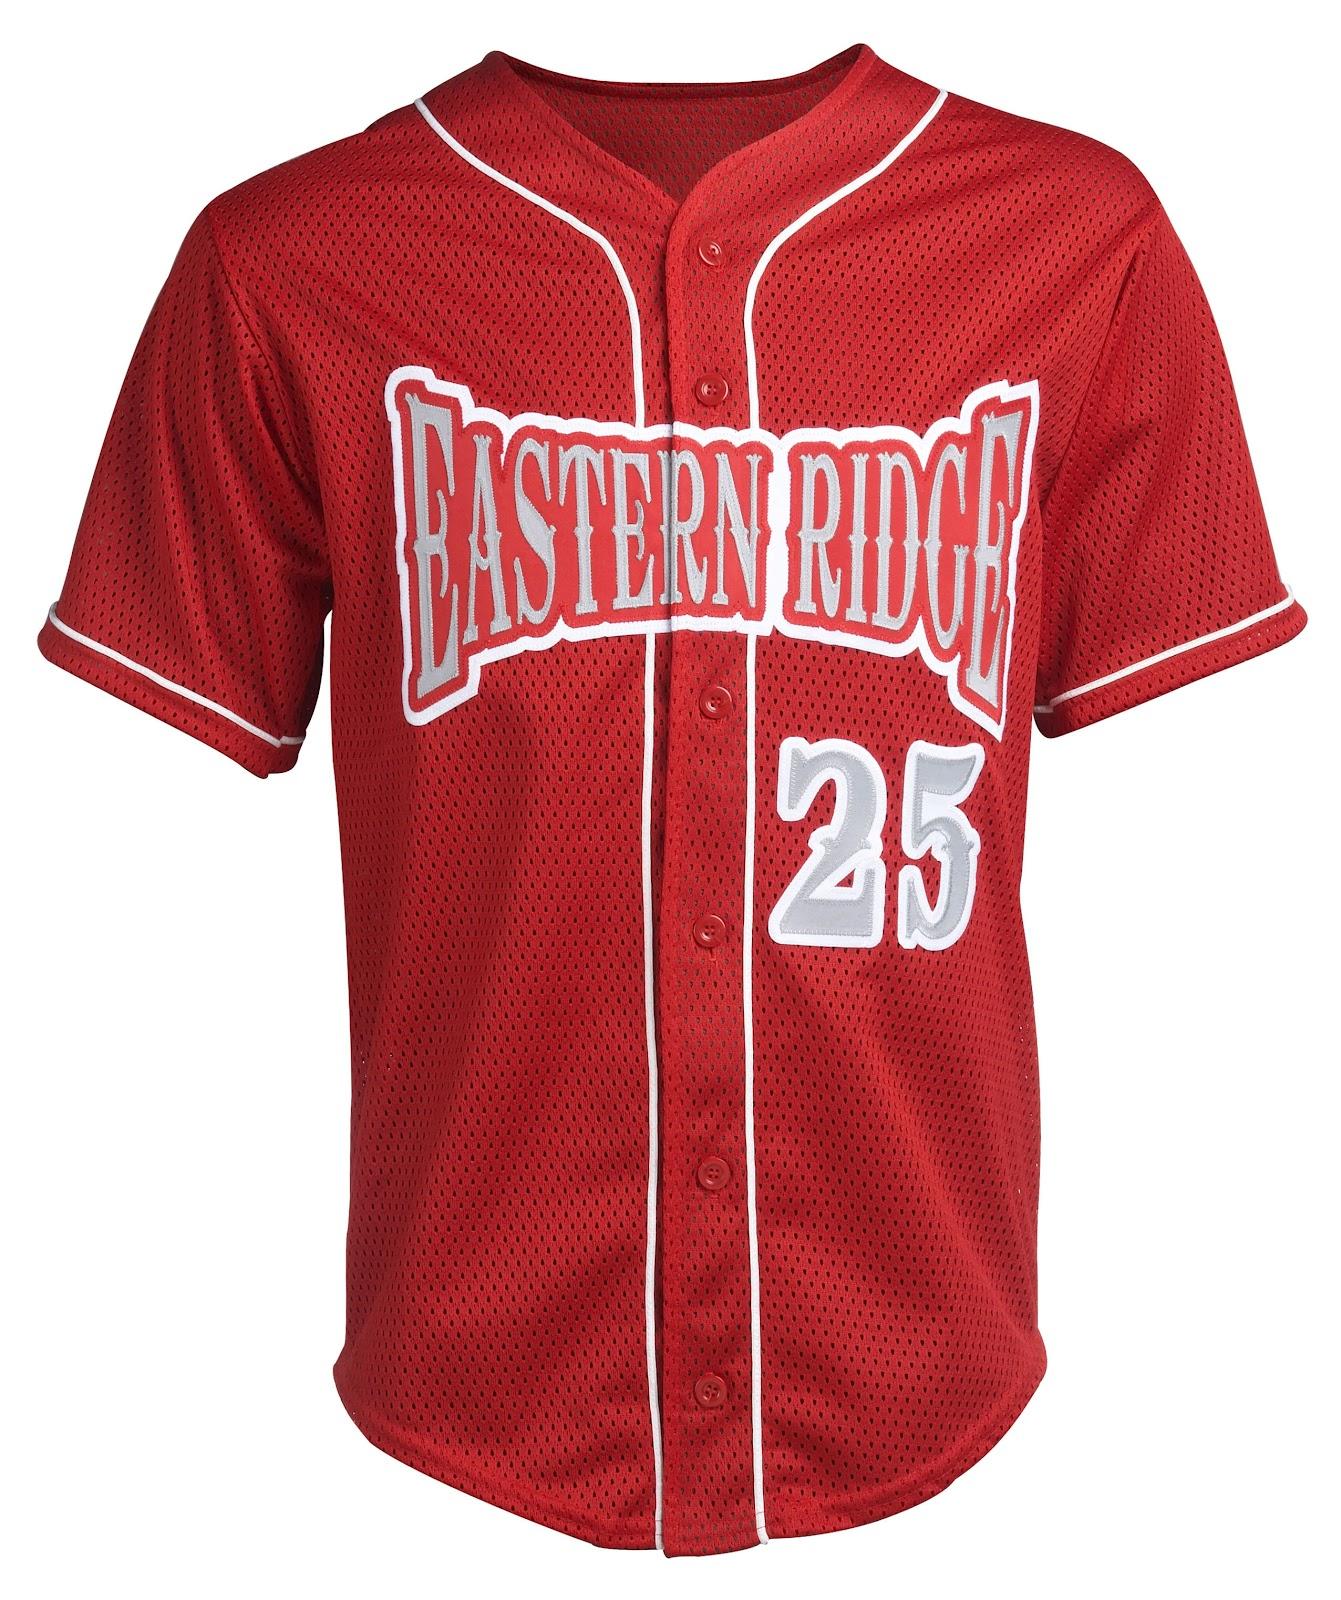 custom design softball jersey jersi sofbol kedai pakaian sukan - Softball Jersey Design Ideas